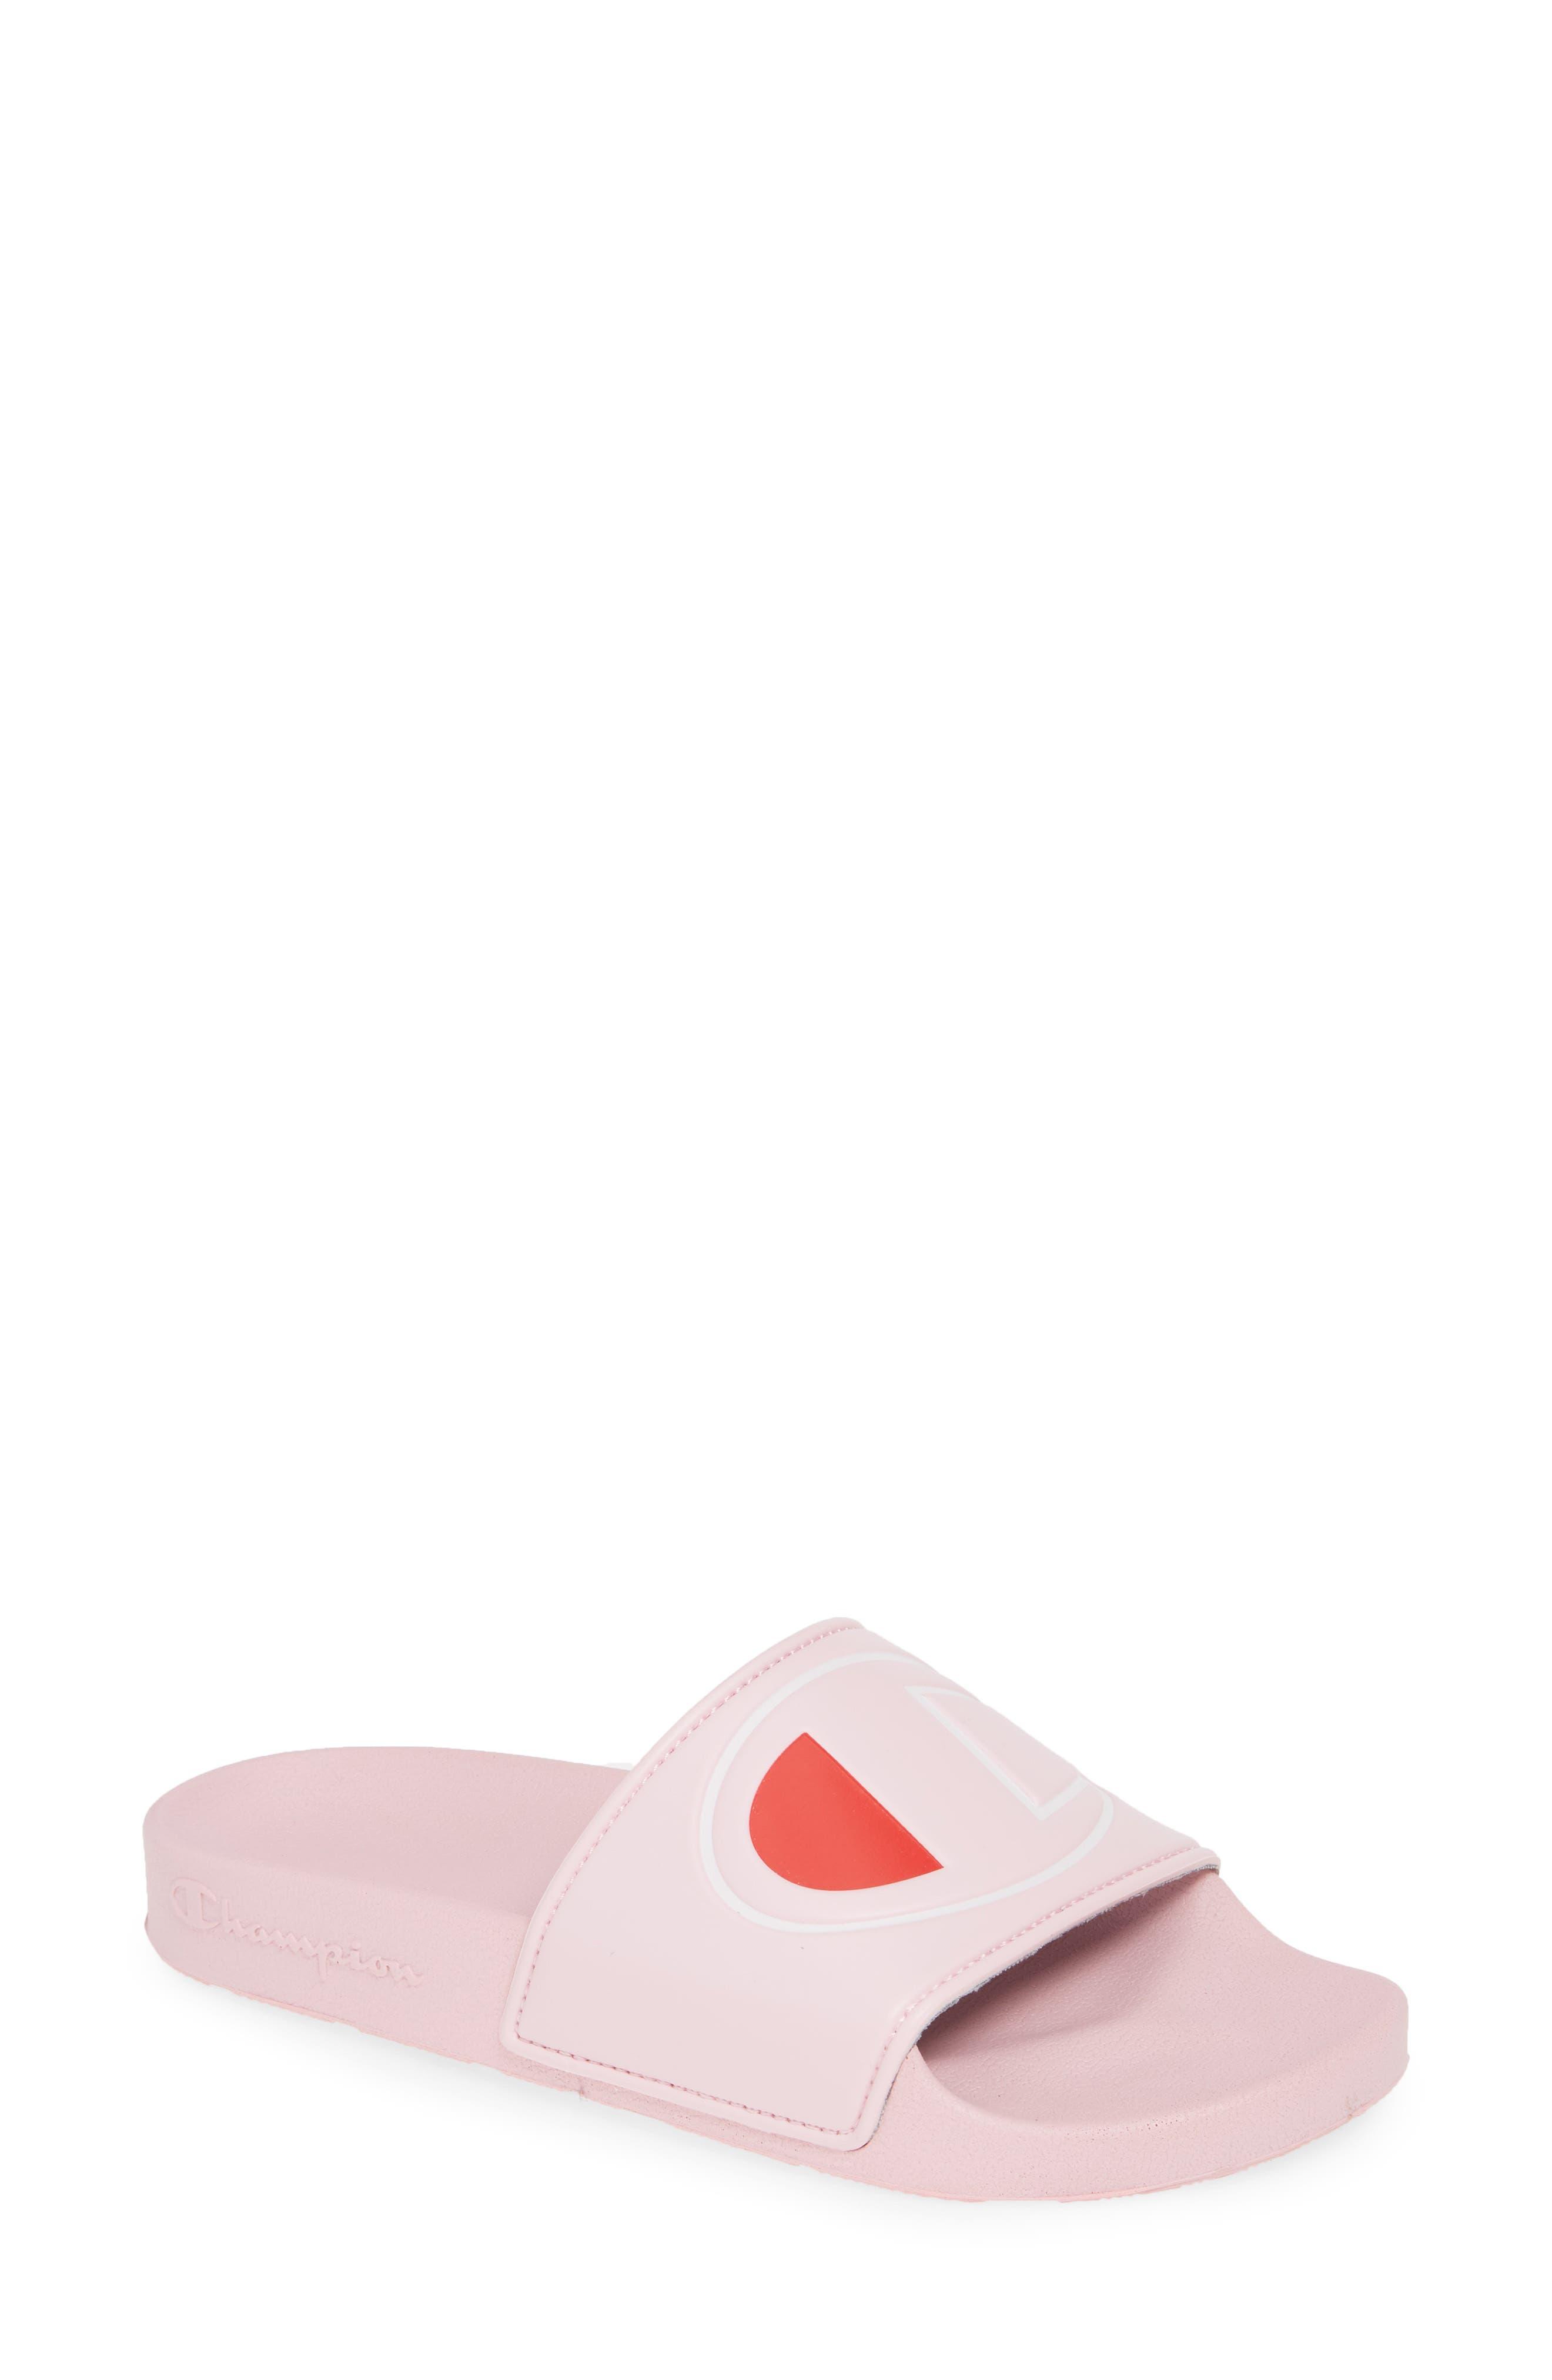 5006623145f5 Women s Champion Slide Sandals